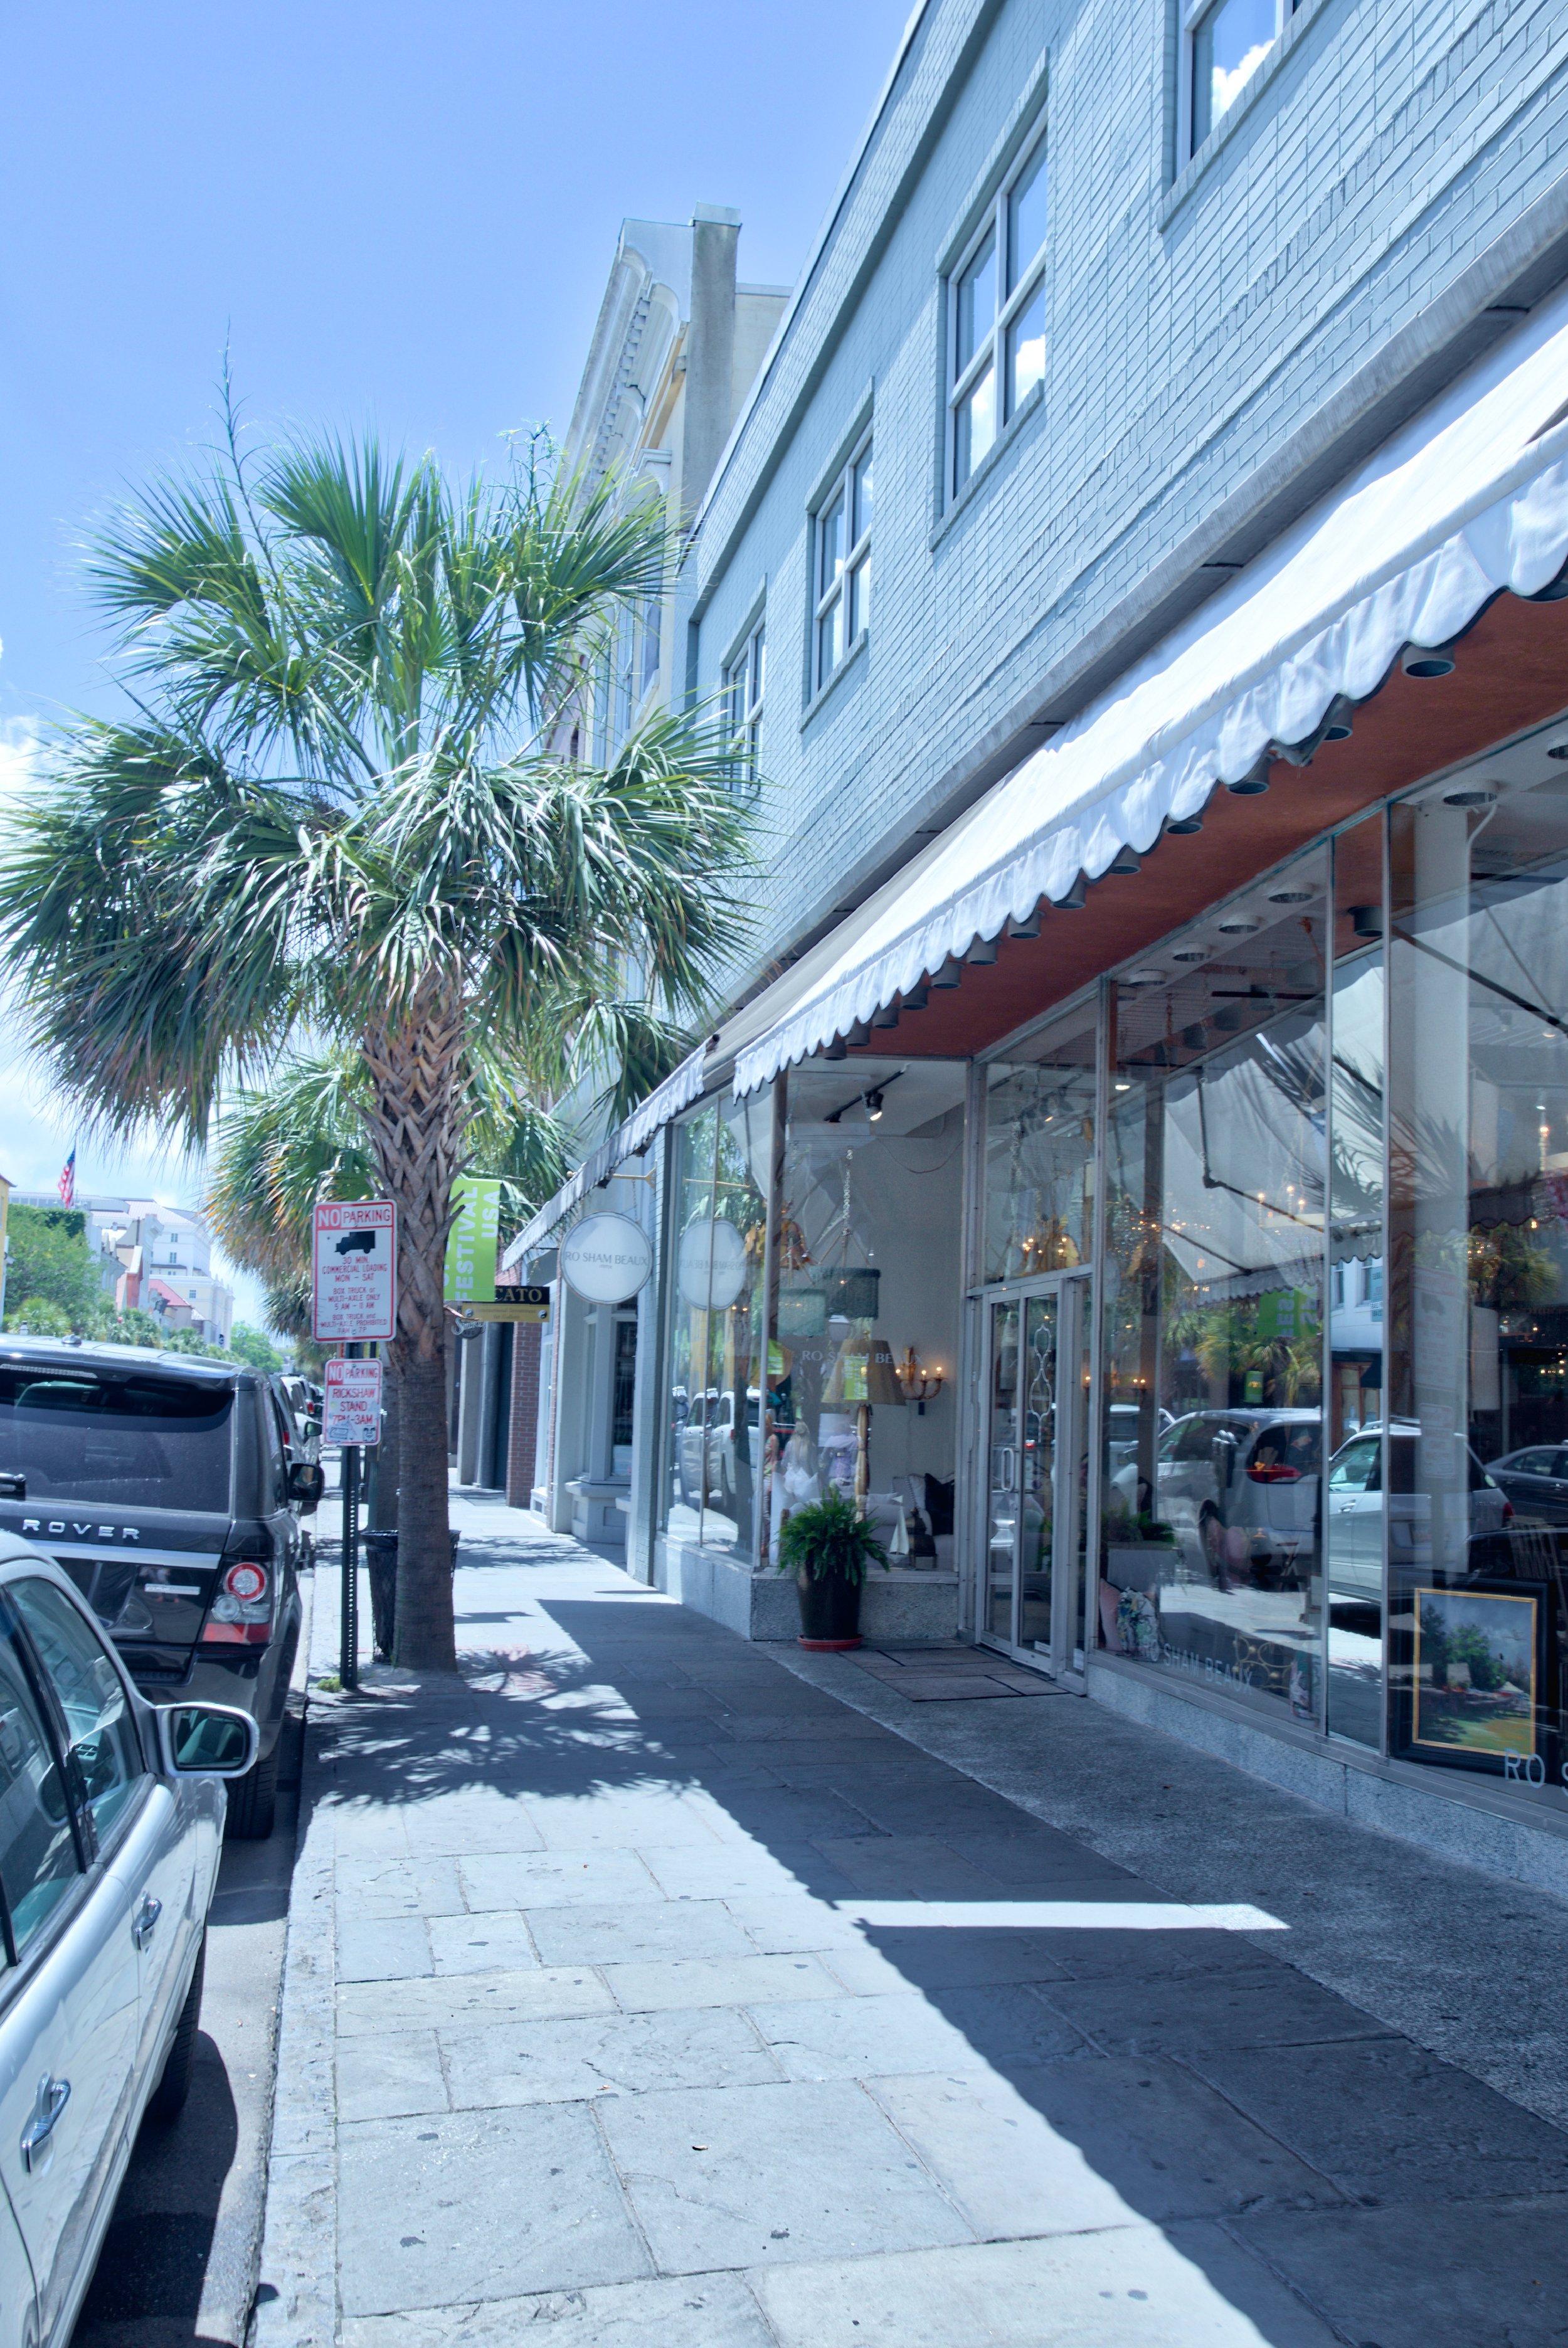 3Charleston SC King Street Shopping and Restaurants Nearby7.jpeg